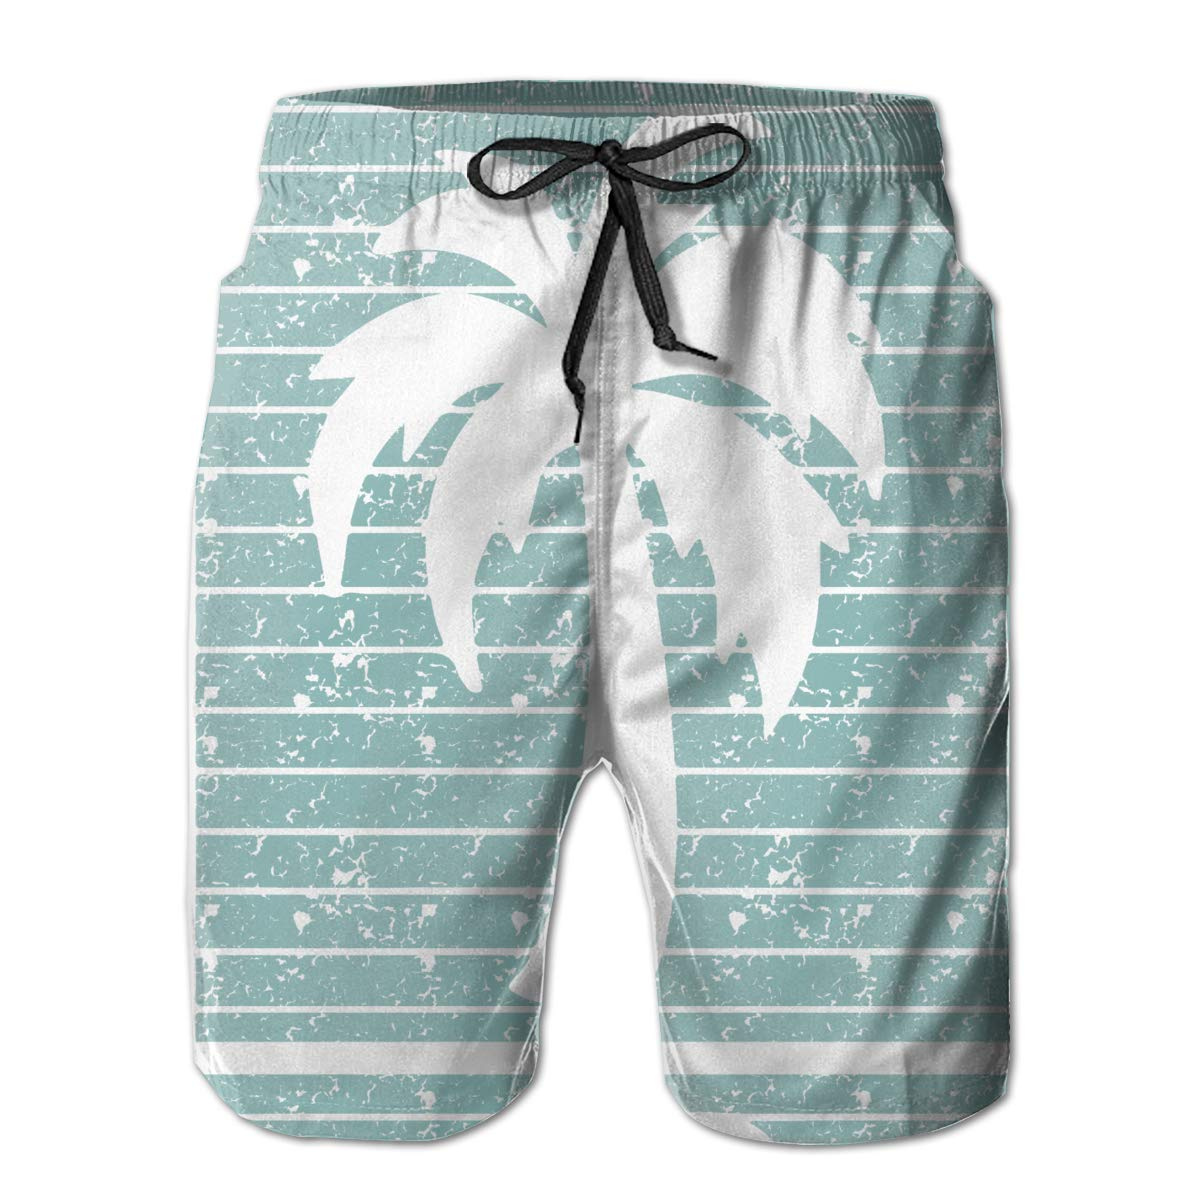 HZamora/_H Mens California Republic Turquoise Palm Summer Breathable Quick-Drying Swim Trunks Beach Shorts Cargo Shorts